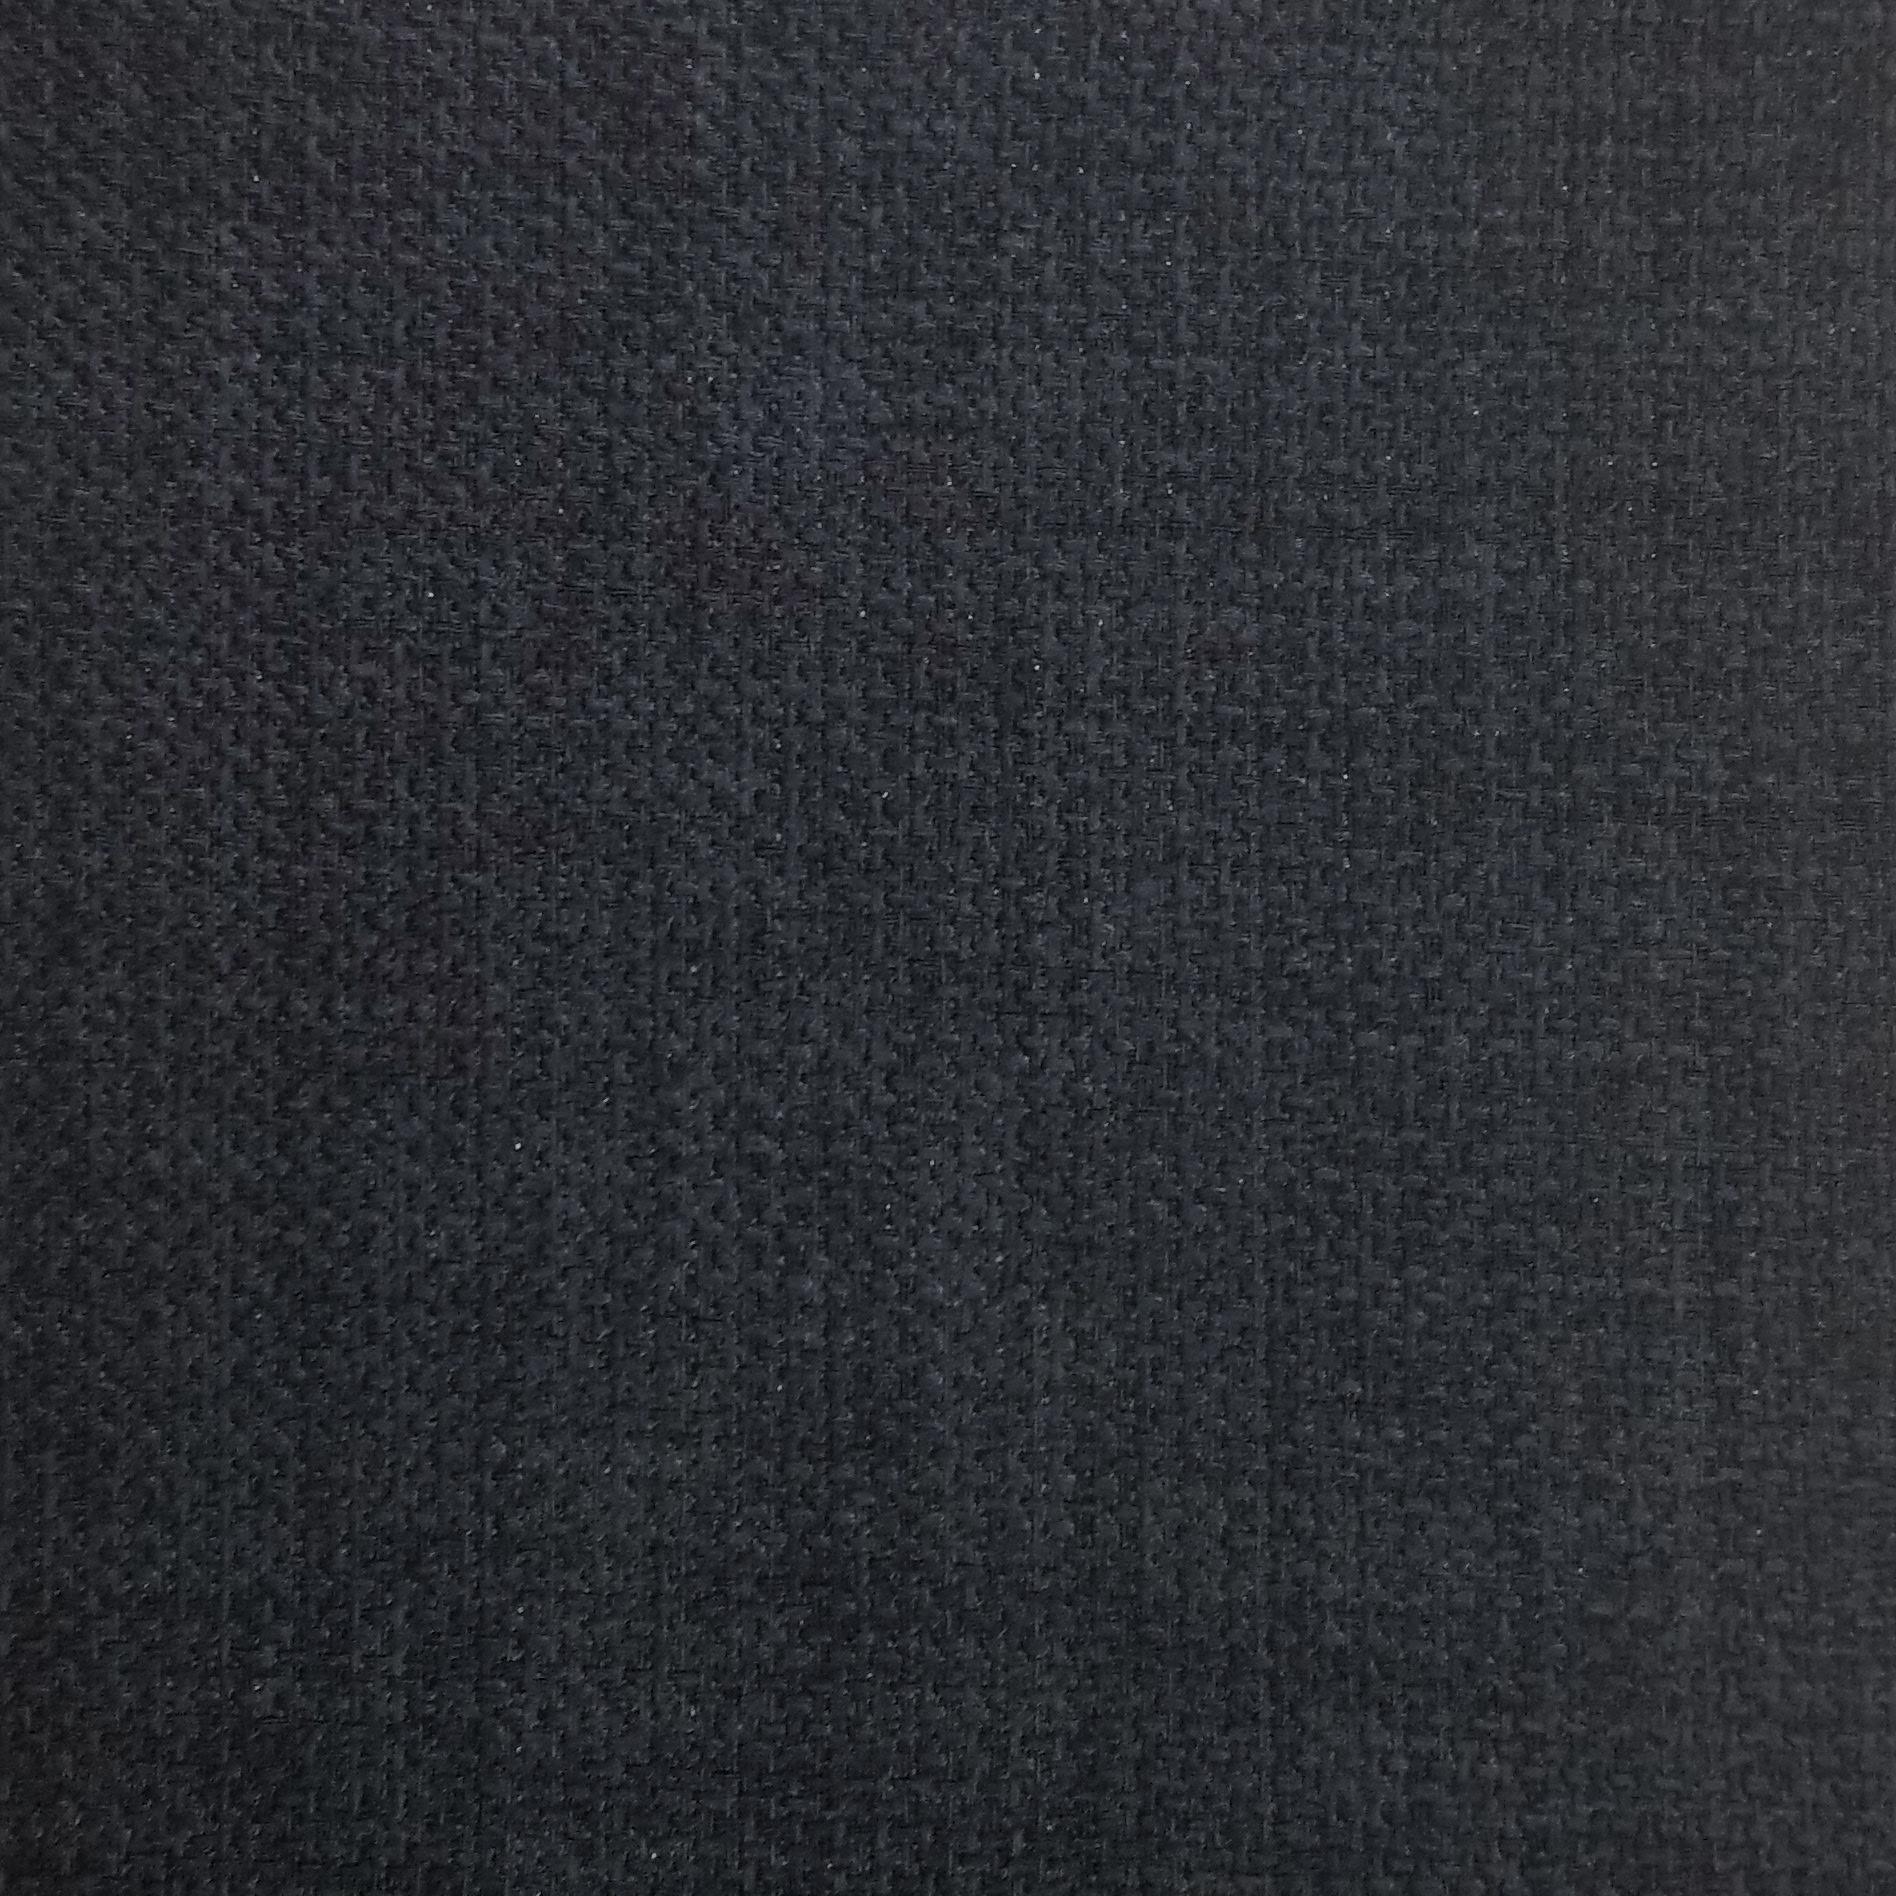 D118 - Rave indigo